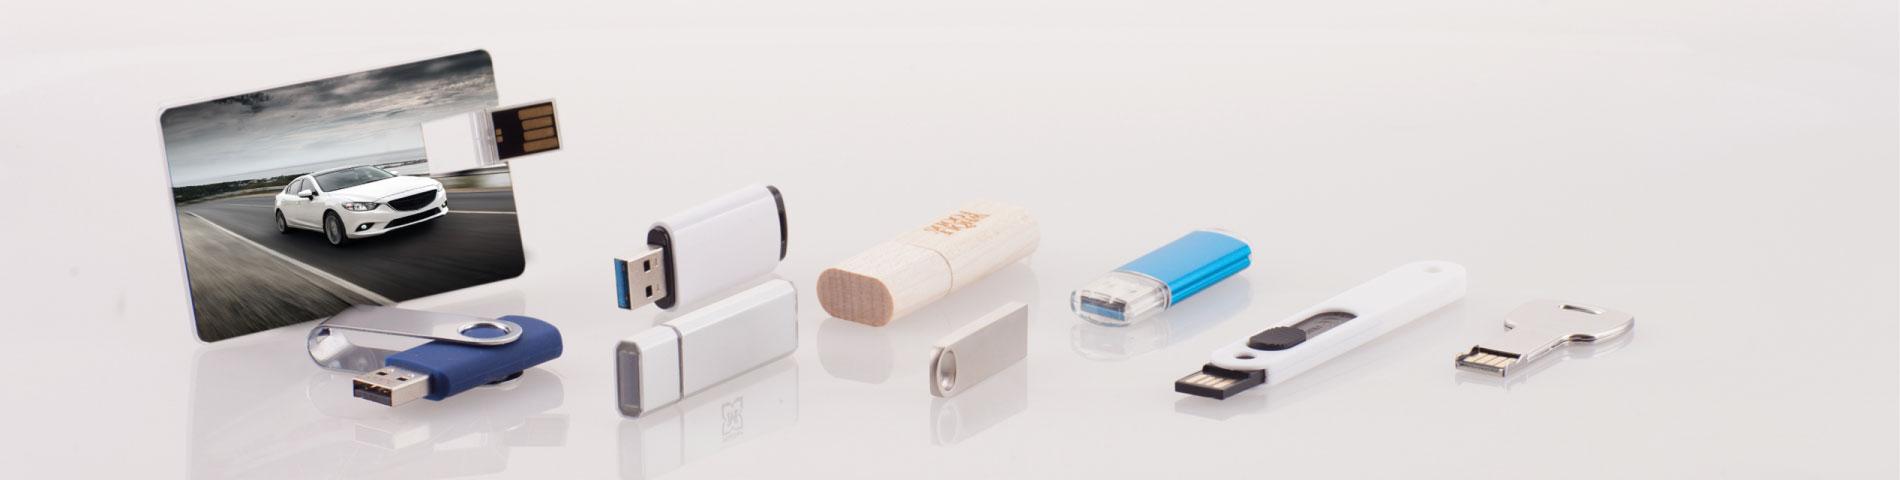 Werbemittel USB stick Filerex, innovativ, ideeen